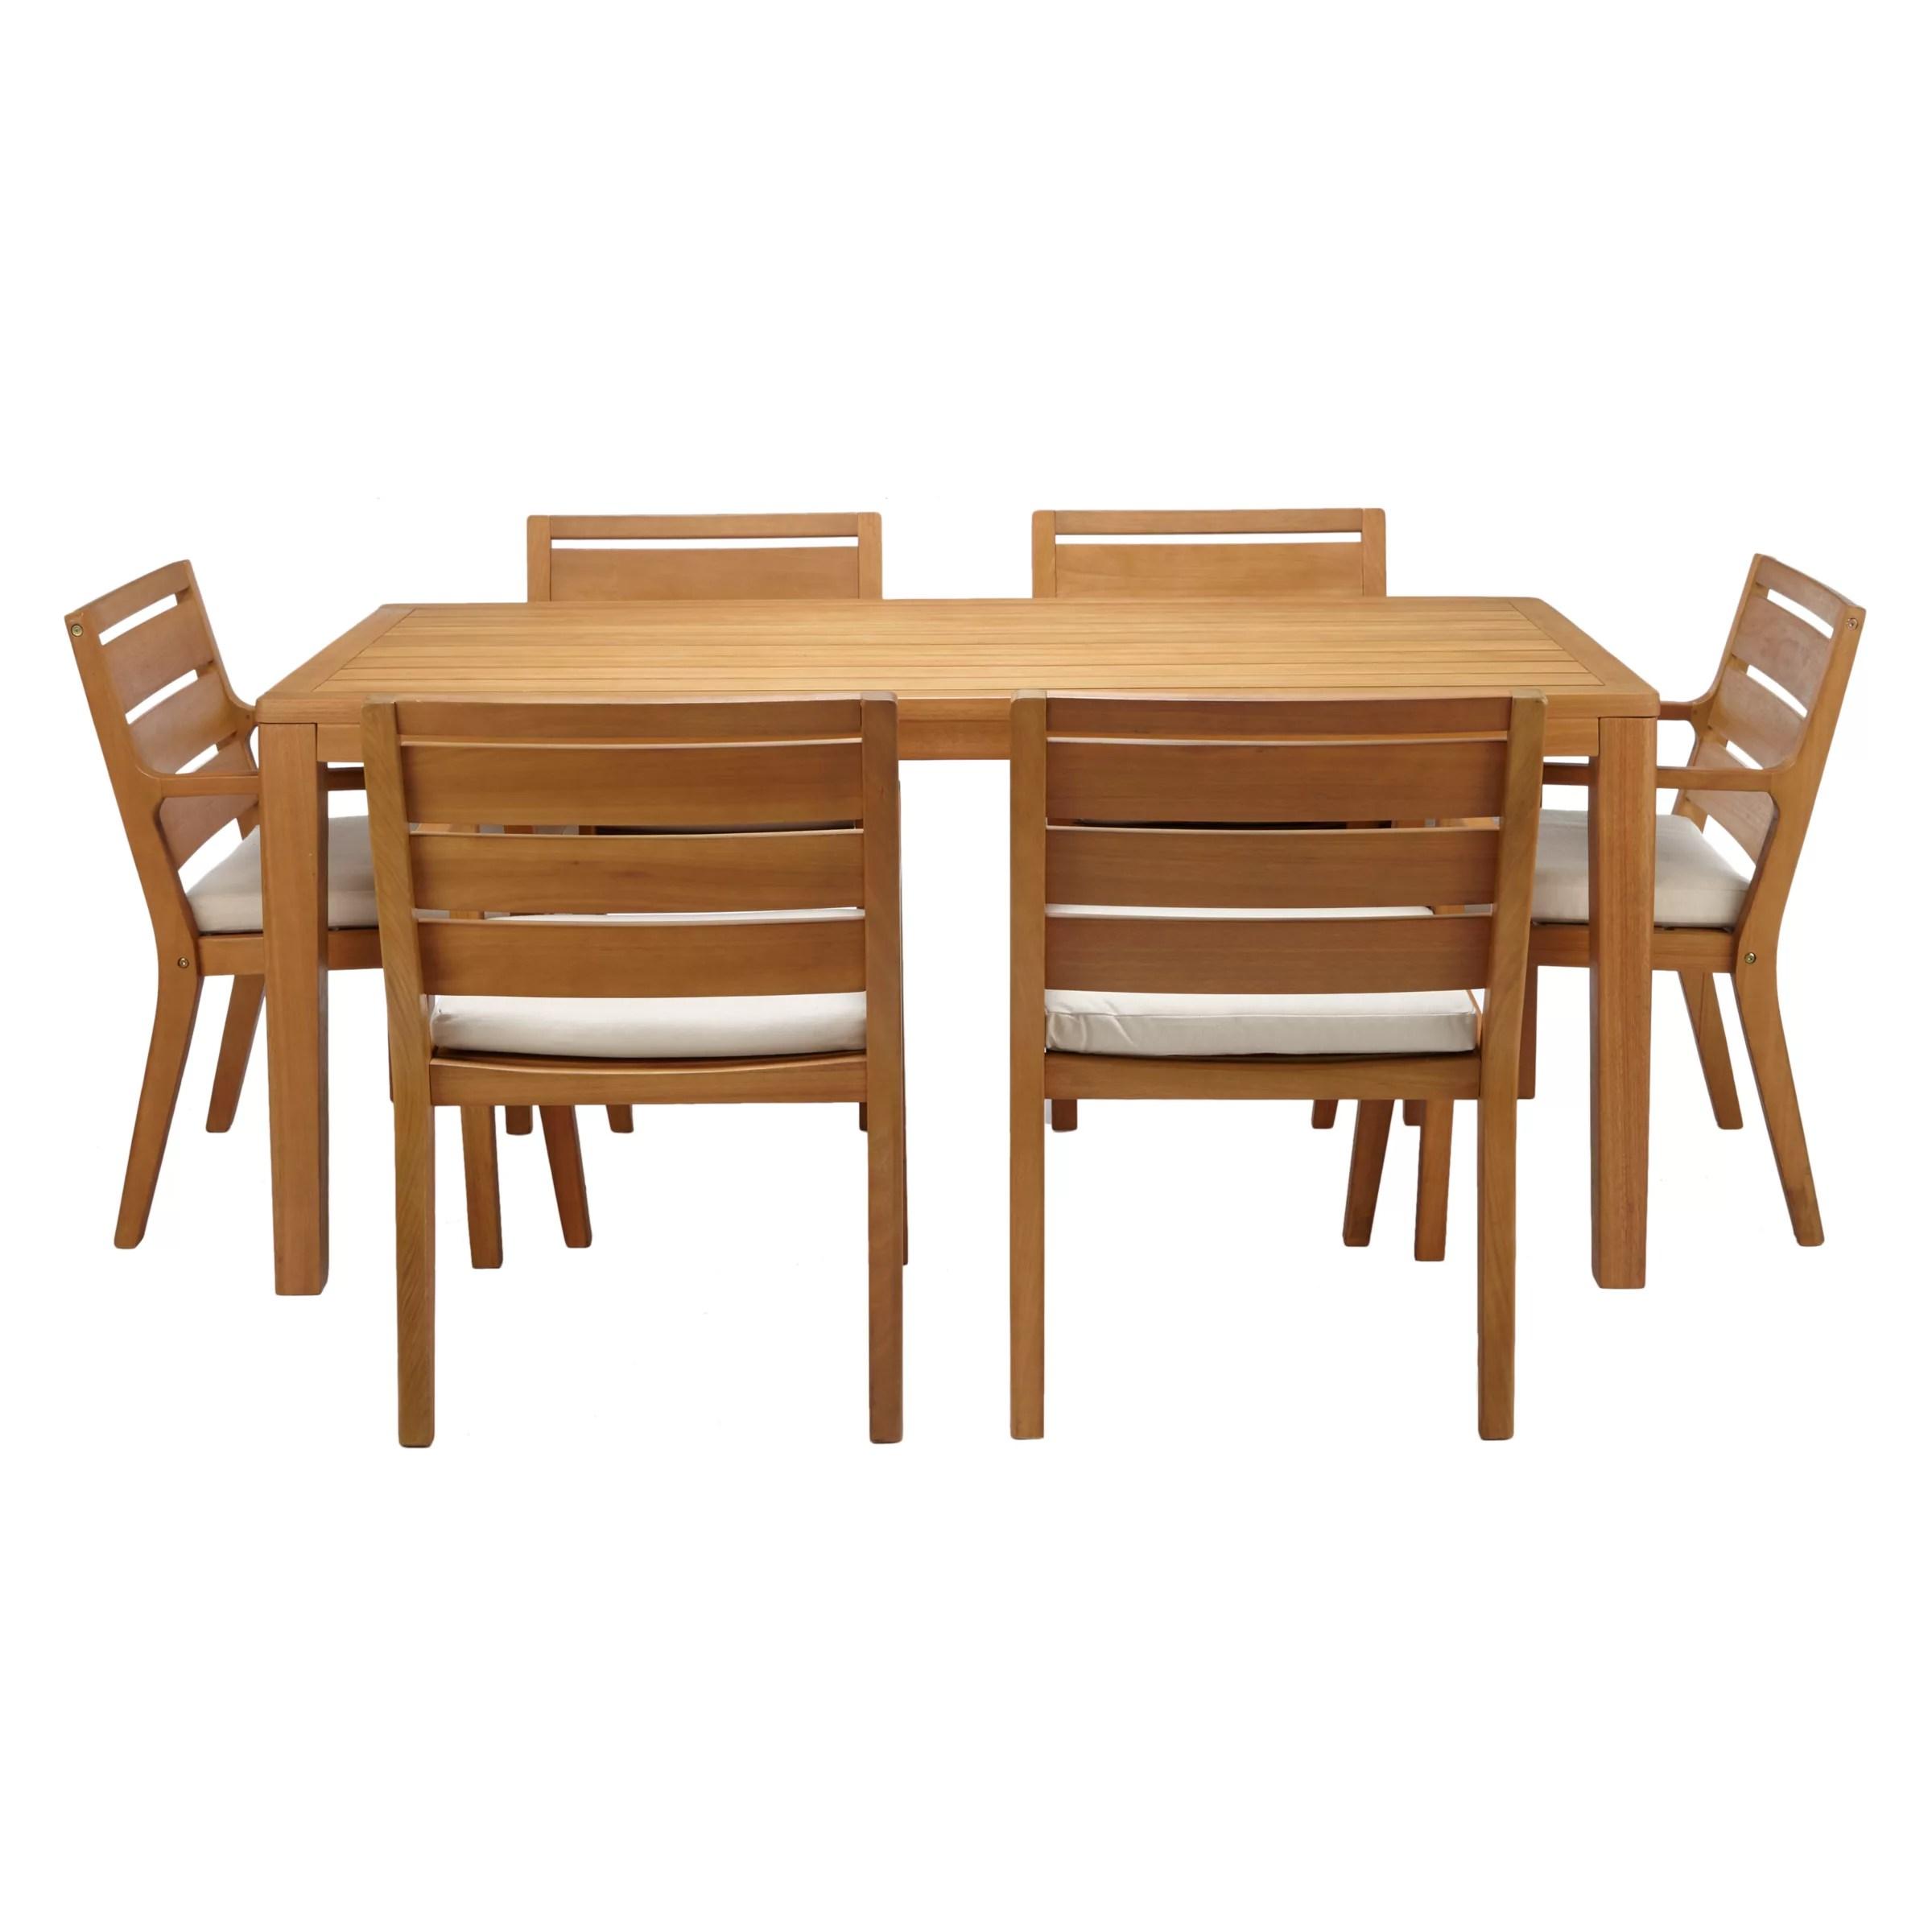 kitchen table chairs set wall mounted utensil holder john lewis alta 6 seat garden dining fsc buyjohn certified